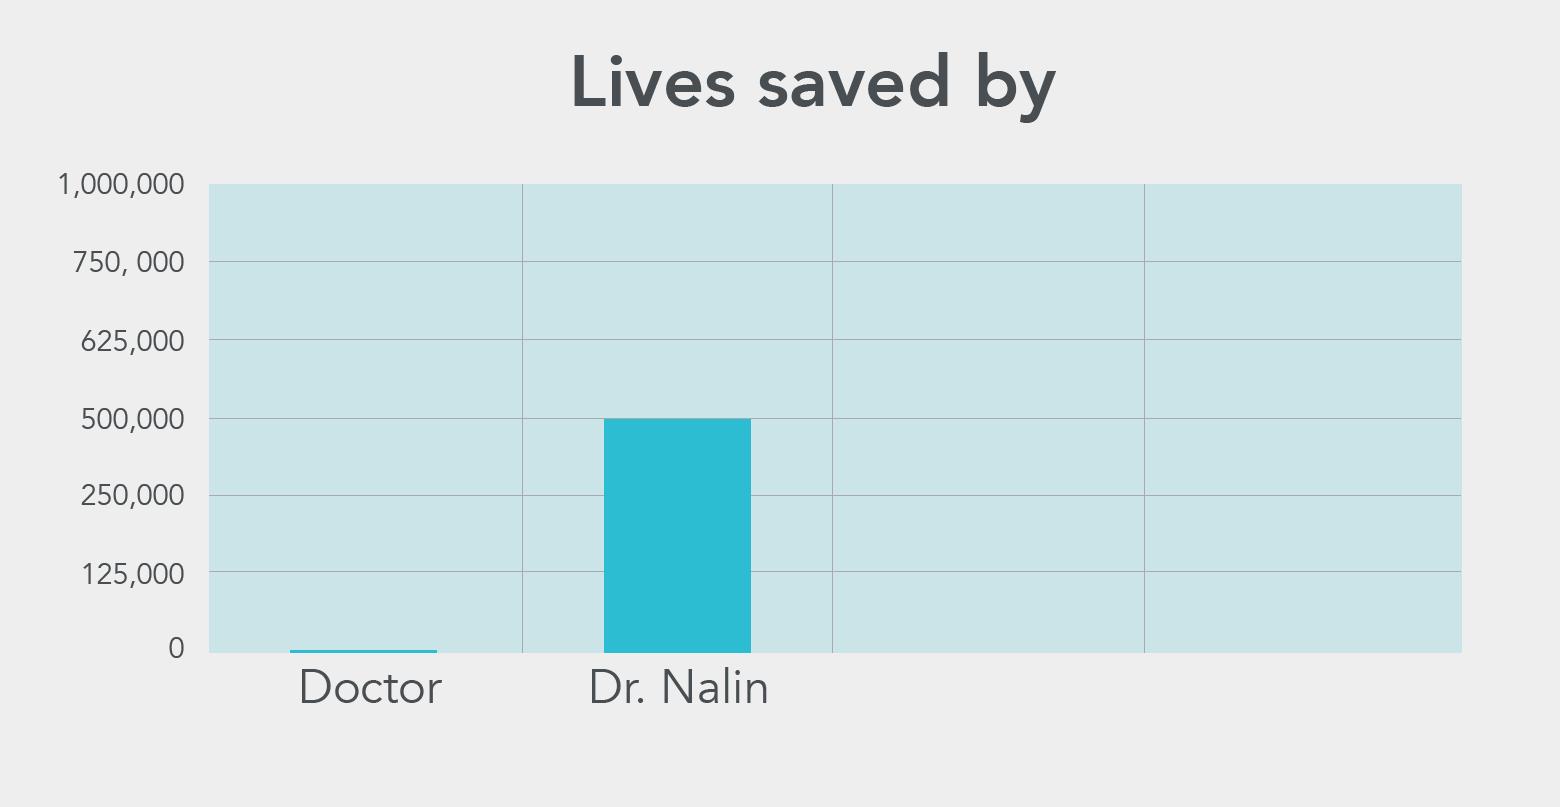 Lives saved by Dr. Nalin